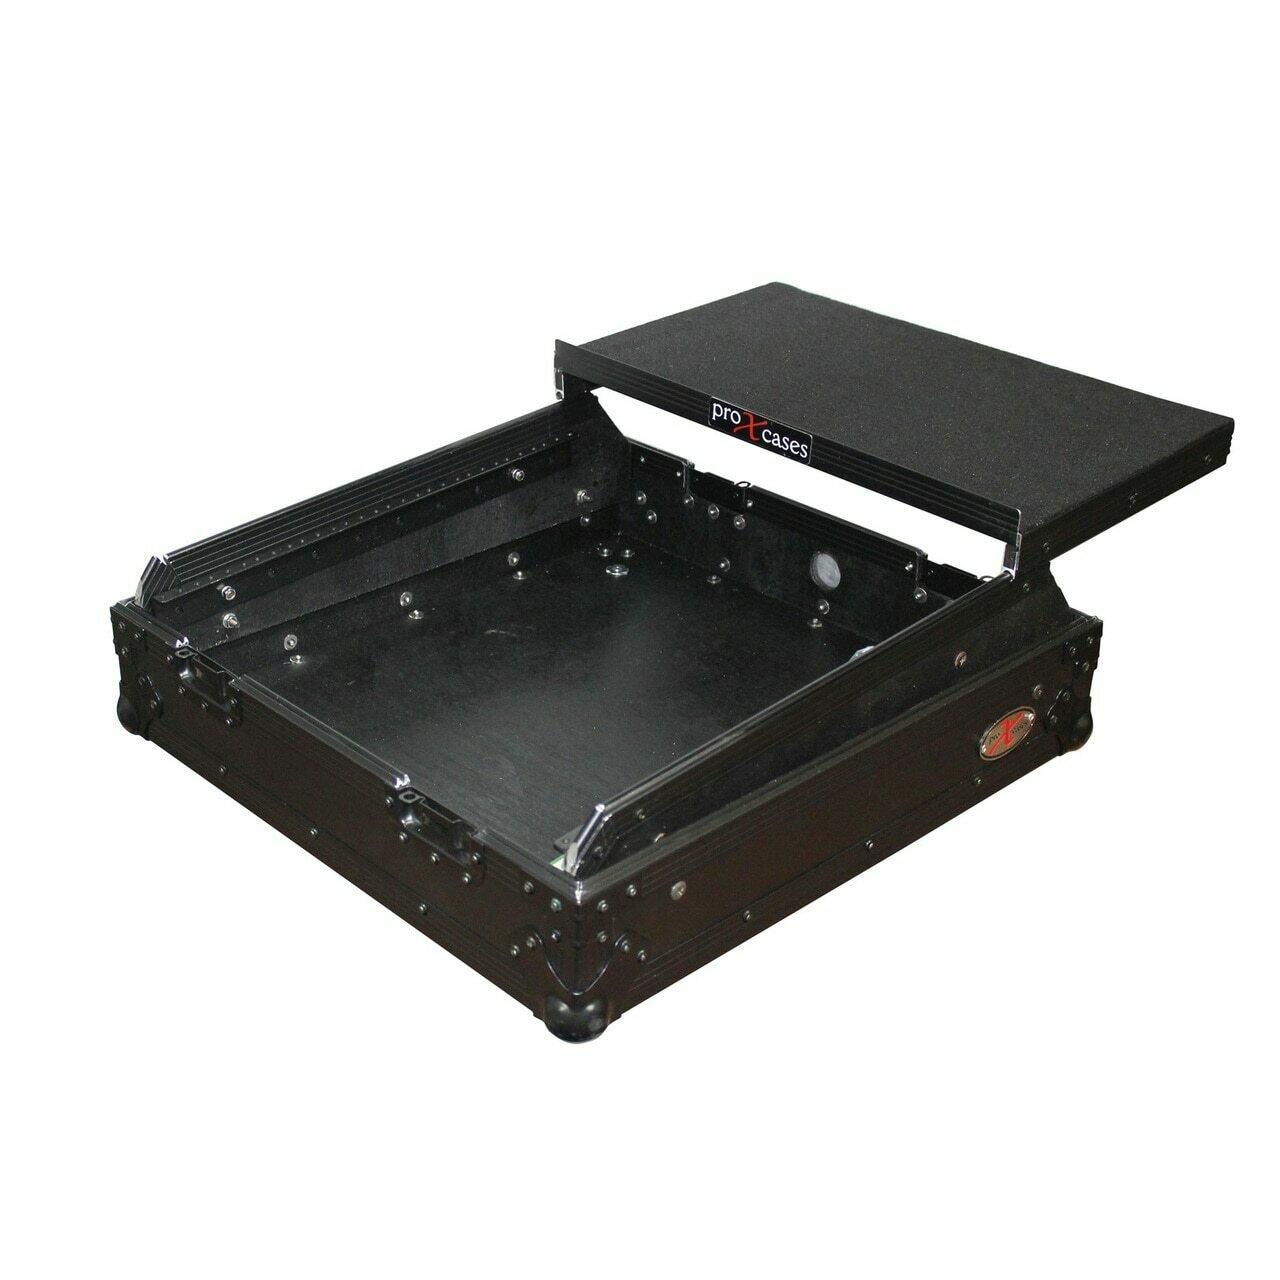 "ProX 19"" Slant Rackmount Case (10 RU, Black on Black) #PRXS19MIXLTB MFR #XS-19MIXLTBL"